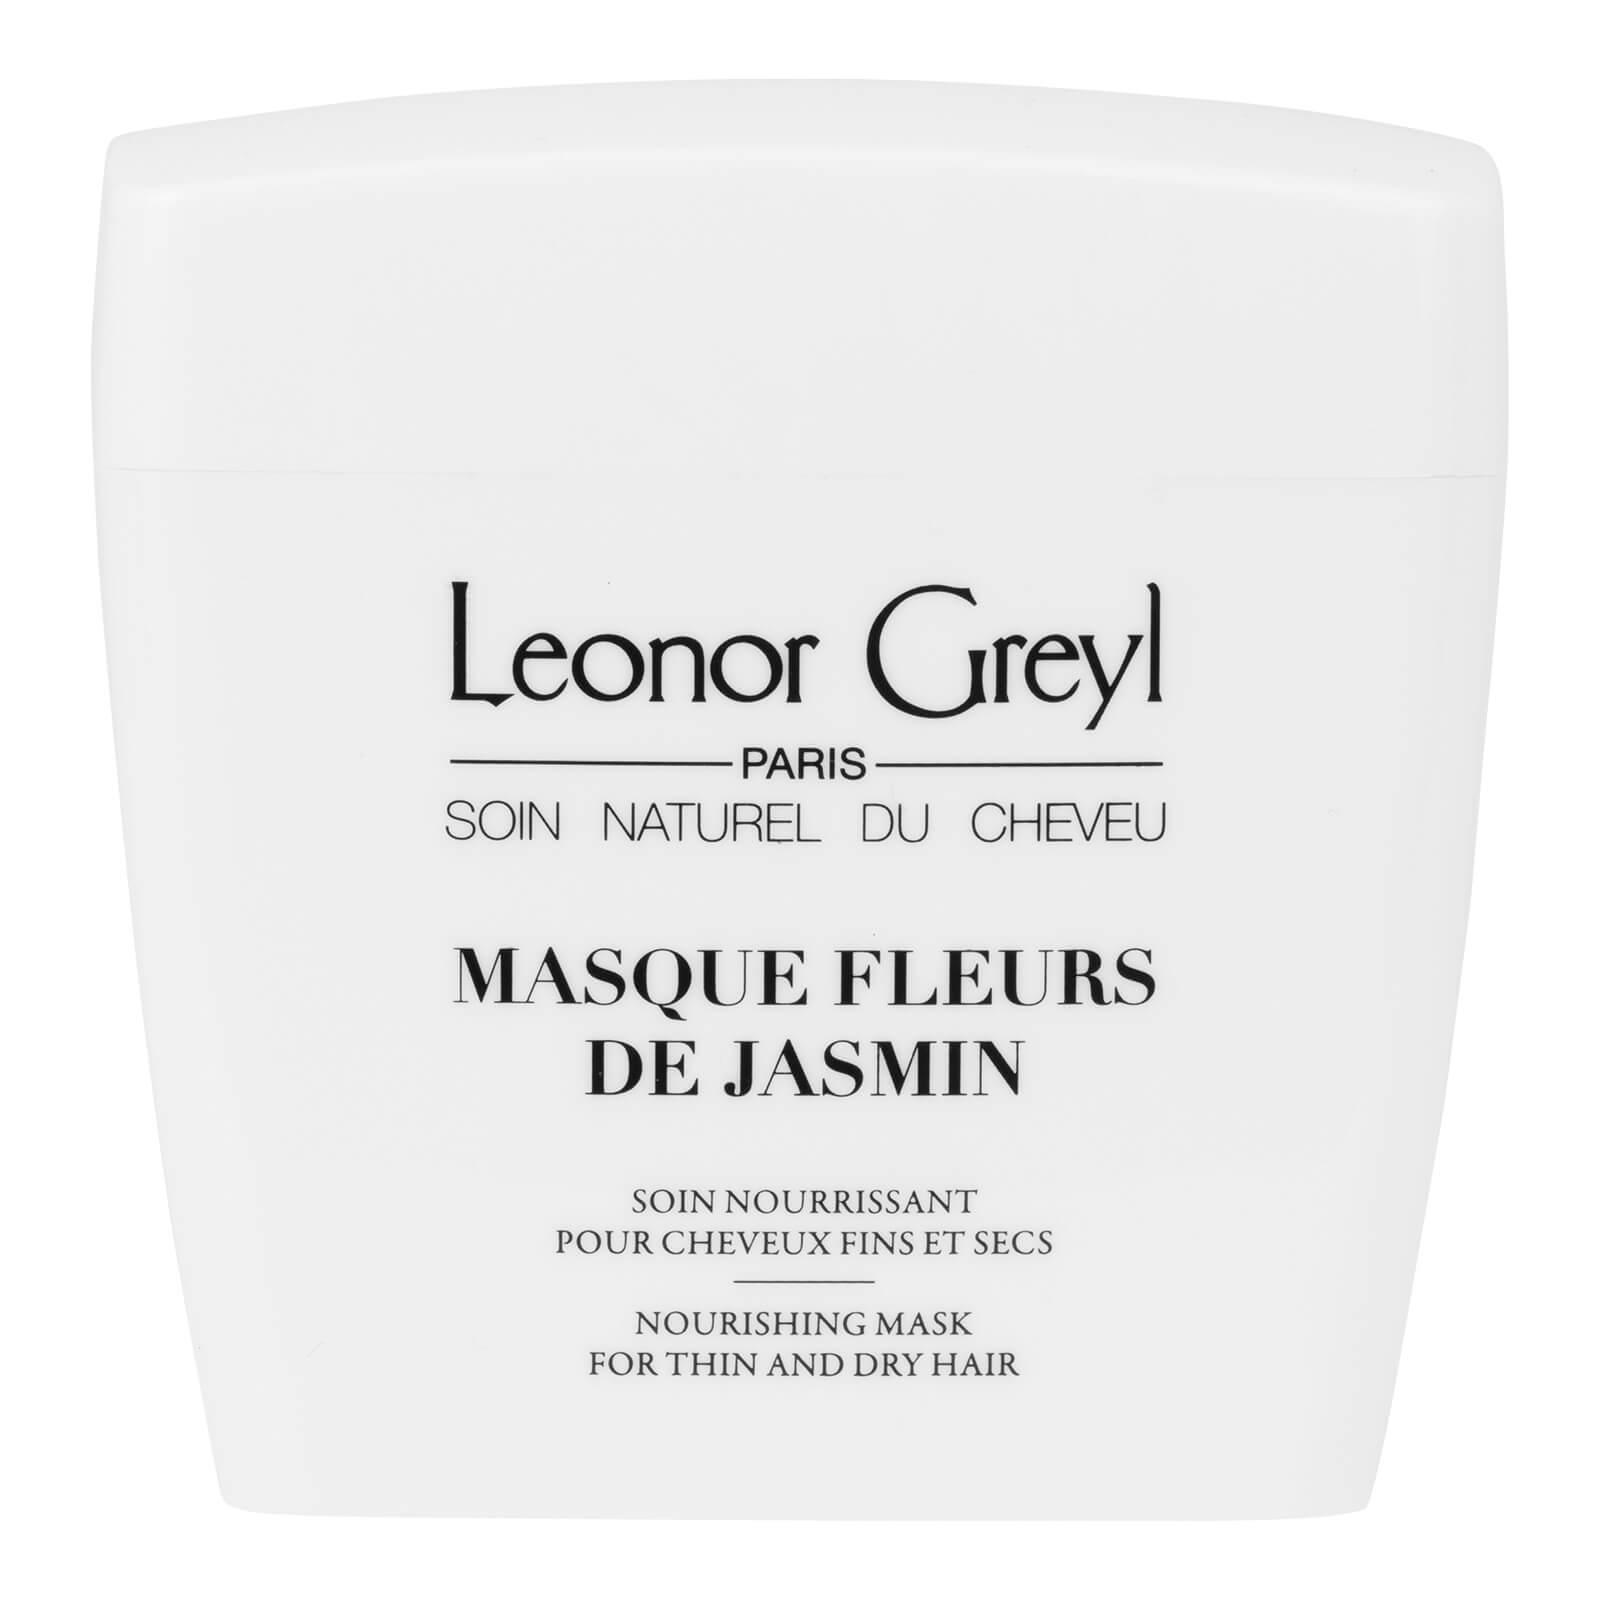 Leonor Greyl Masque Fleurs de Jasmin (Beautifying Mask for All Hair Types)